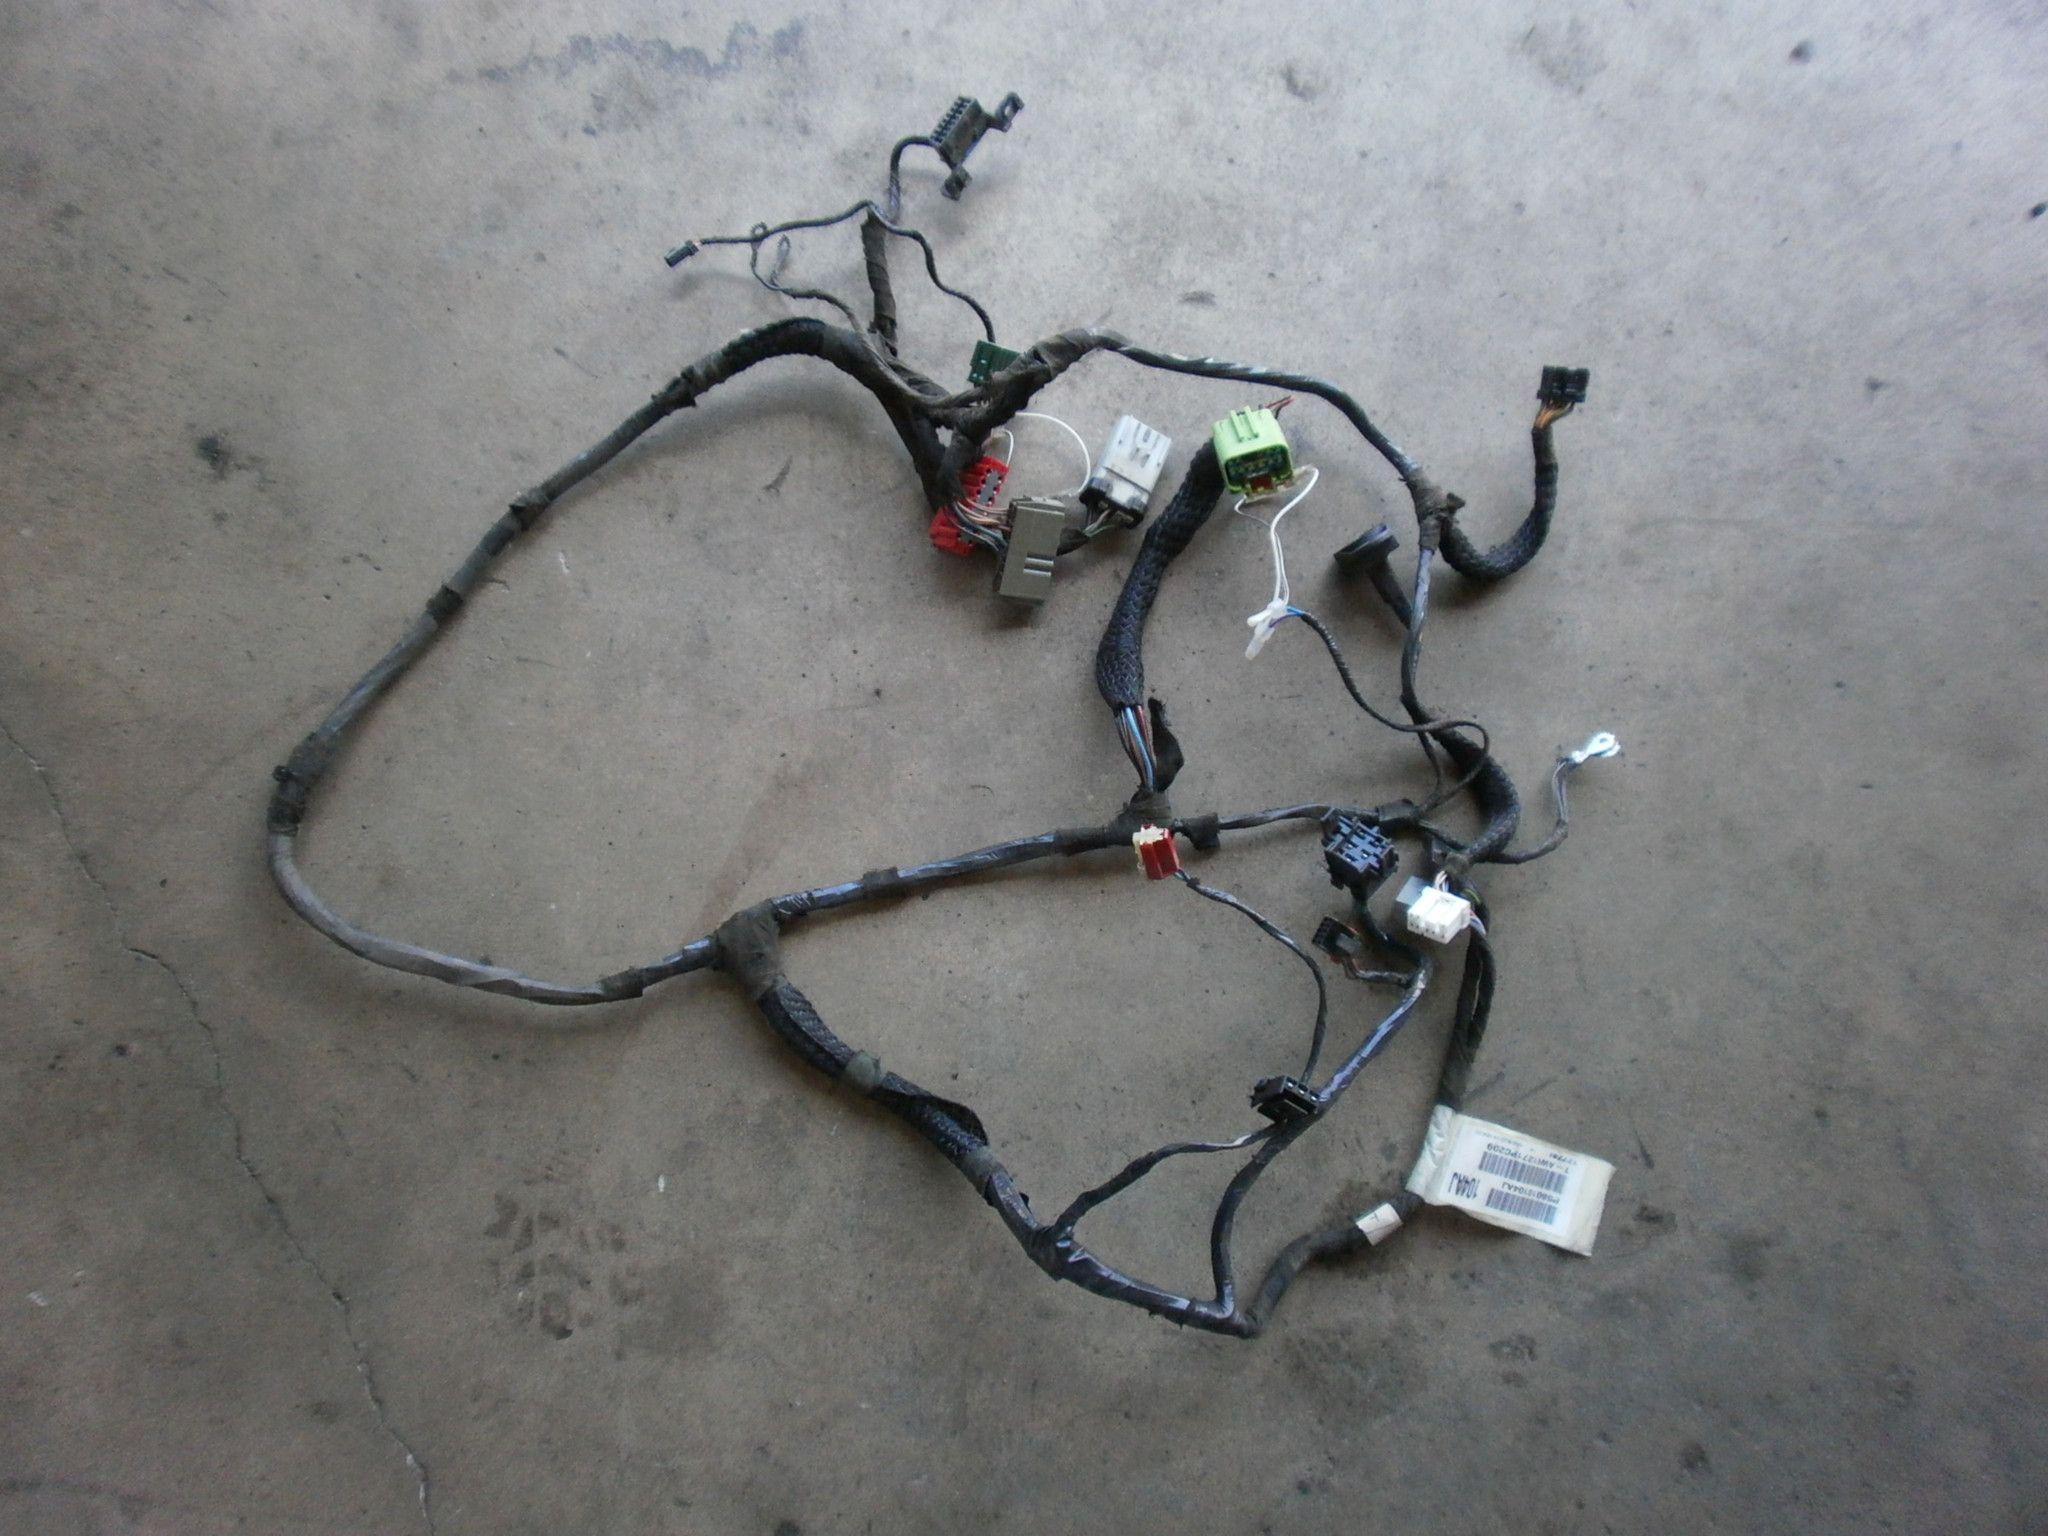 hight resolution of jeep wrangler tj instrument panel wiring harness 2001 p56010104aj oem good used 2 4 4 0